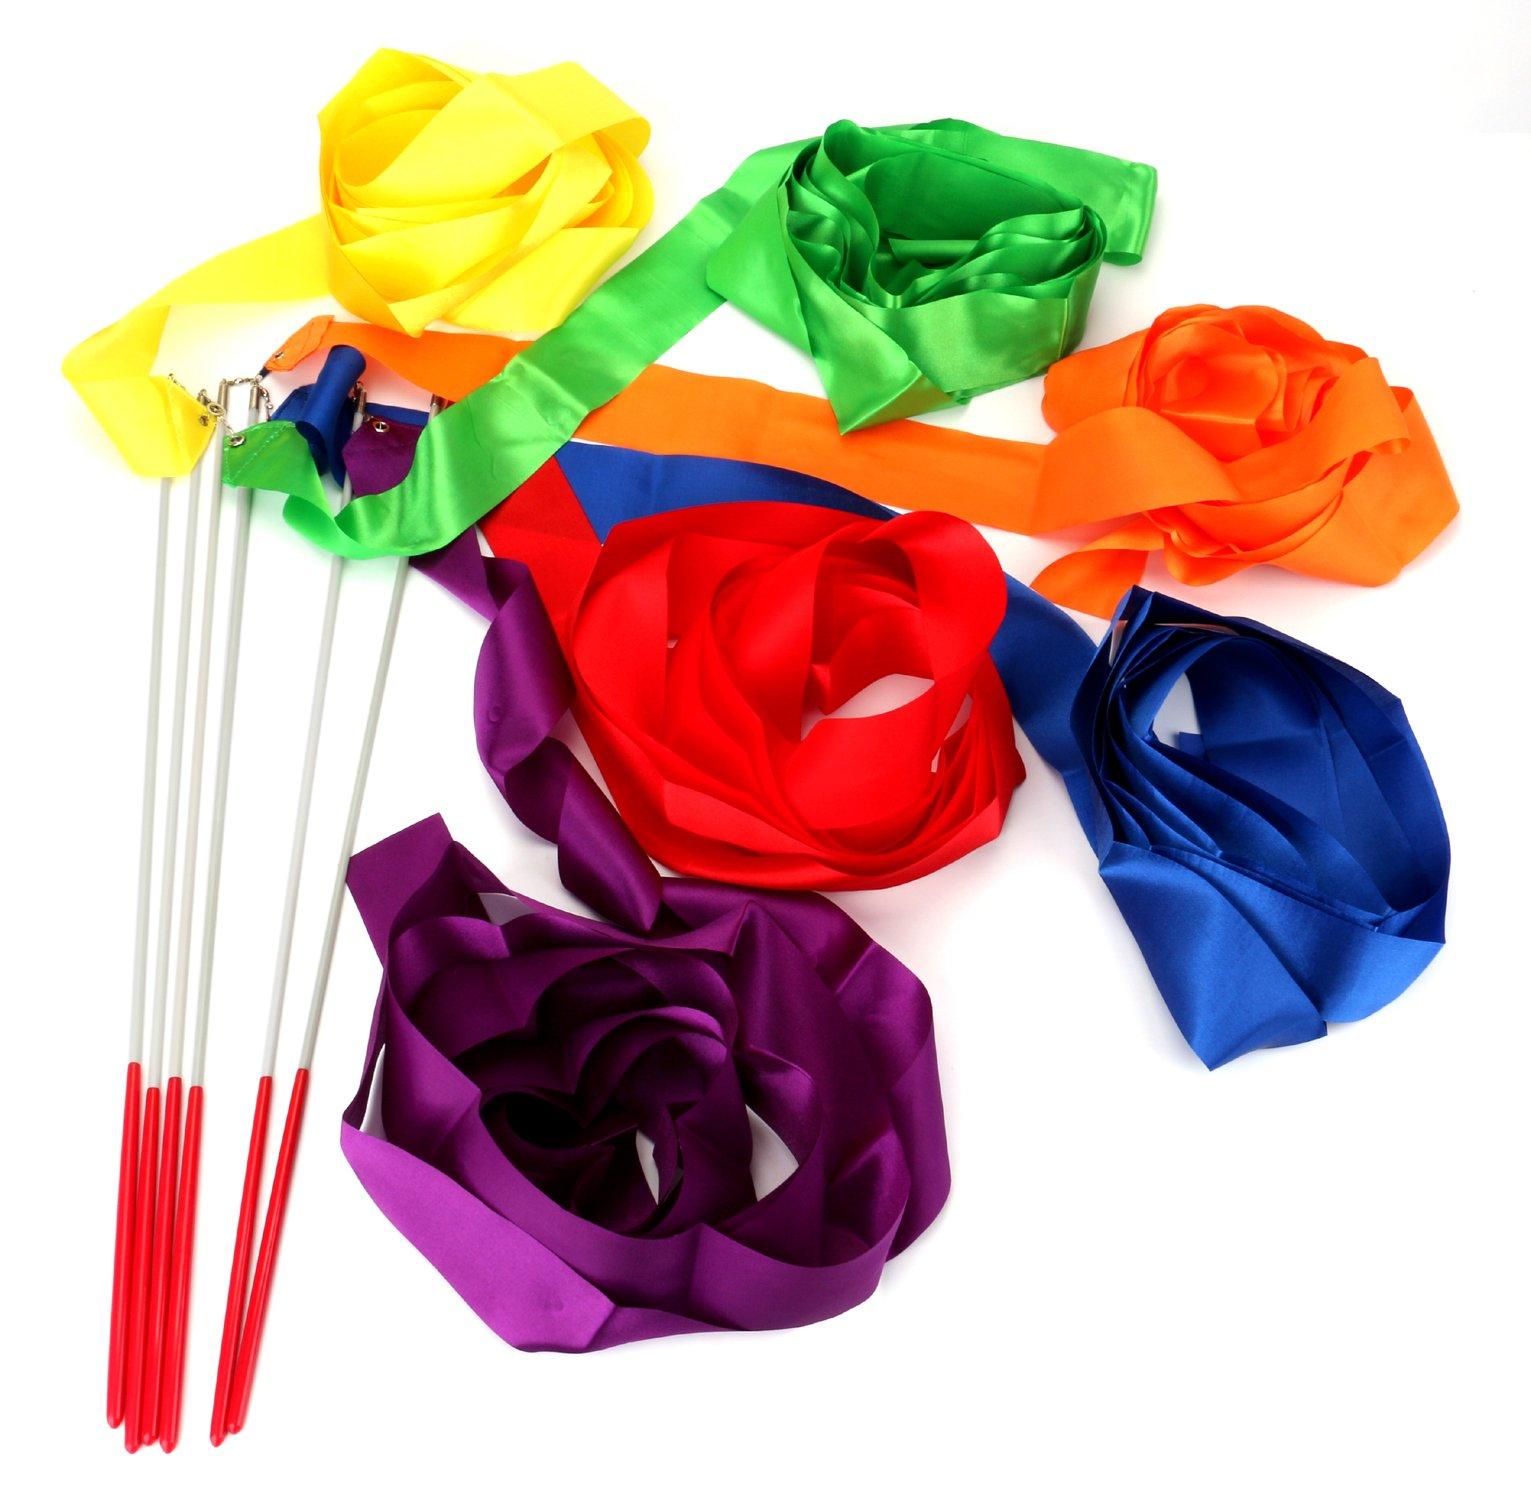 Tosnail 12-Foot Ribbon Dancer Dancing Ribbon Streamer Rhythm Ribbon with 19'' Wand - Set of 6 Colors